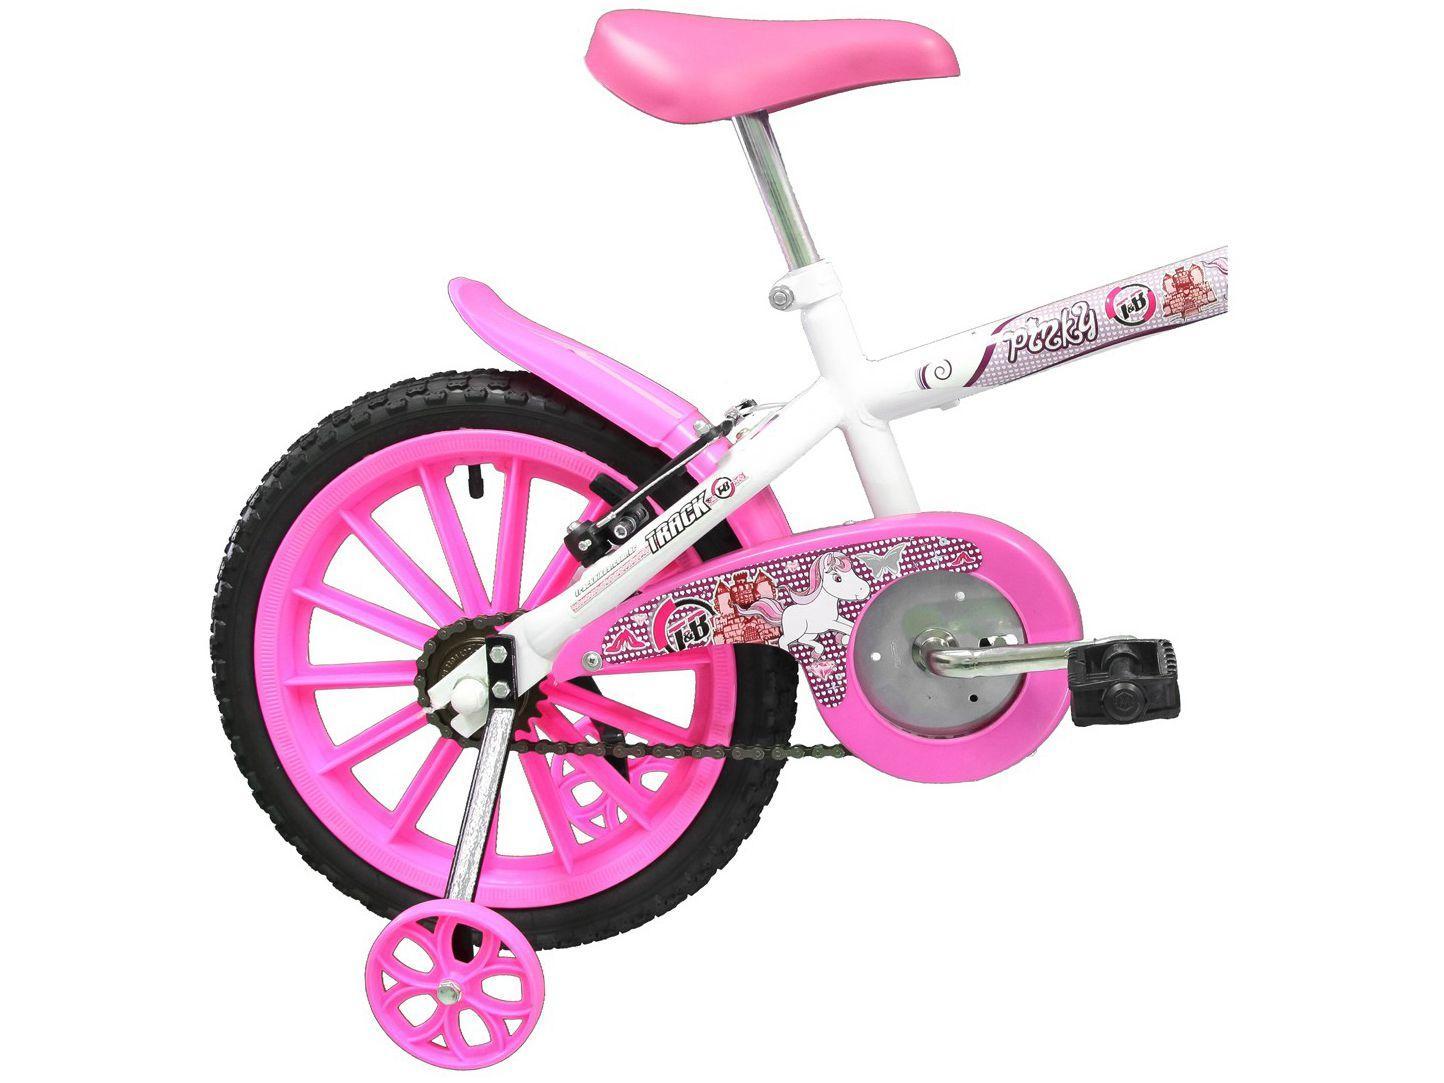 Bicicleta Free Action Aro 16 Kiss Com Cesta Branco e Rosa 040470032 - Status Bike